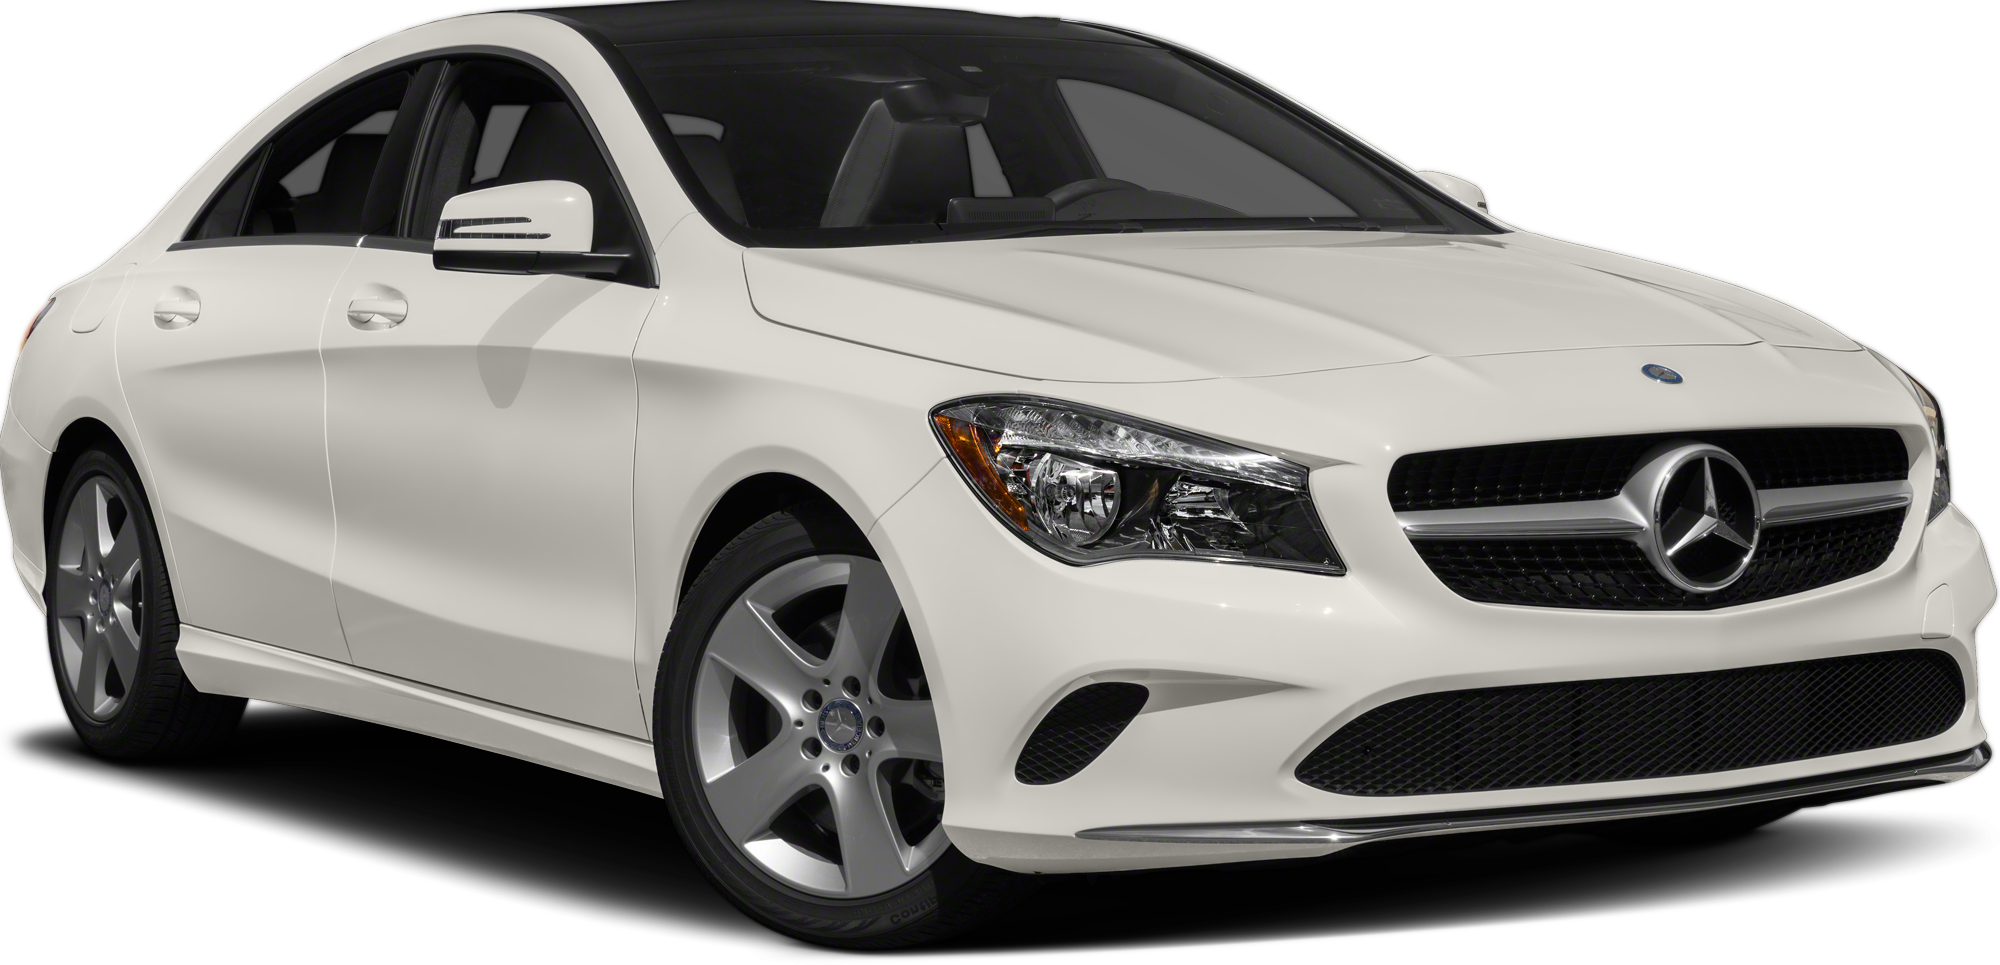 2019 Mercedes Benz Cla 250 Incentives Specials Offers In San Jose Ca